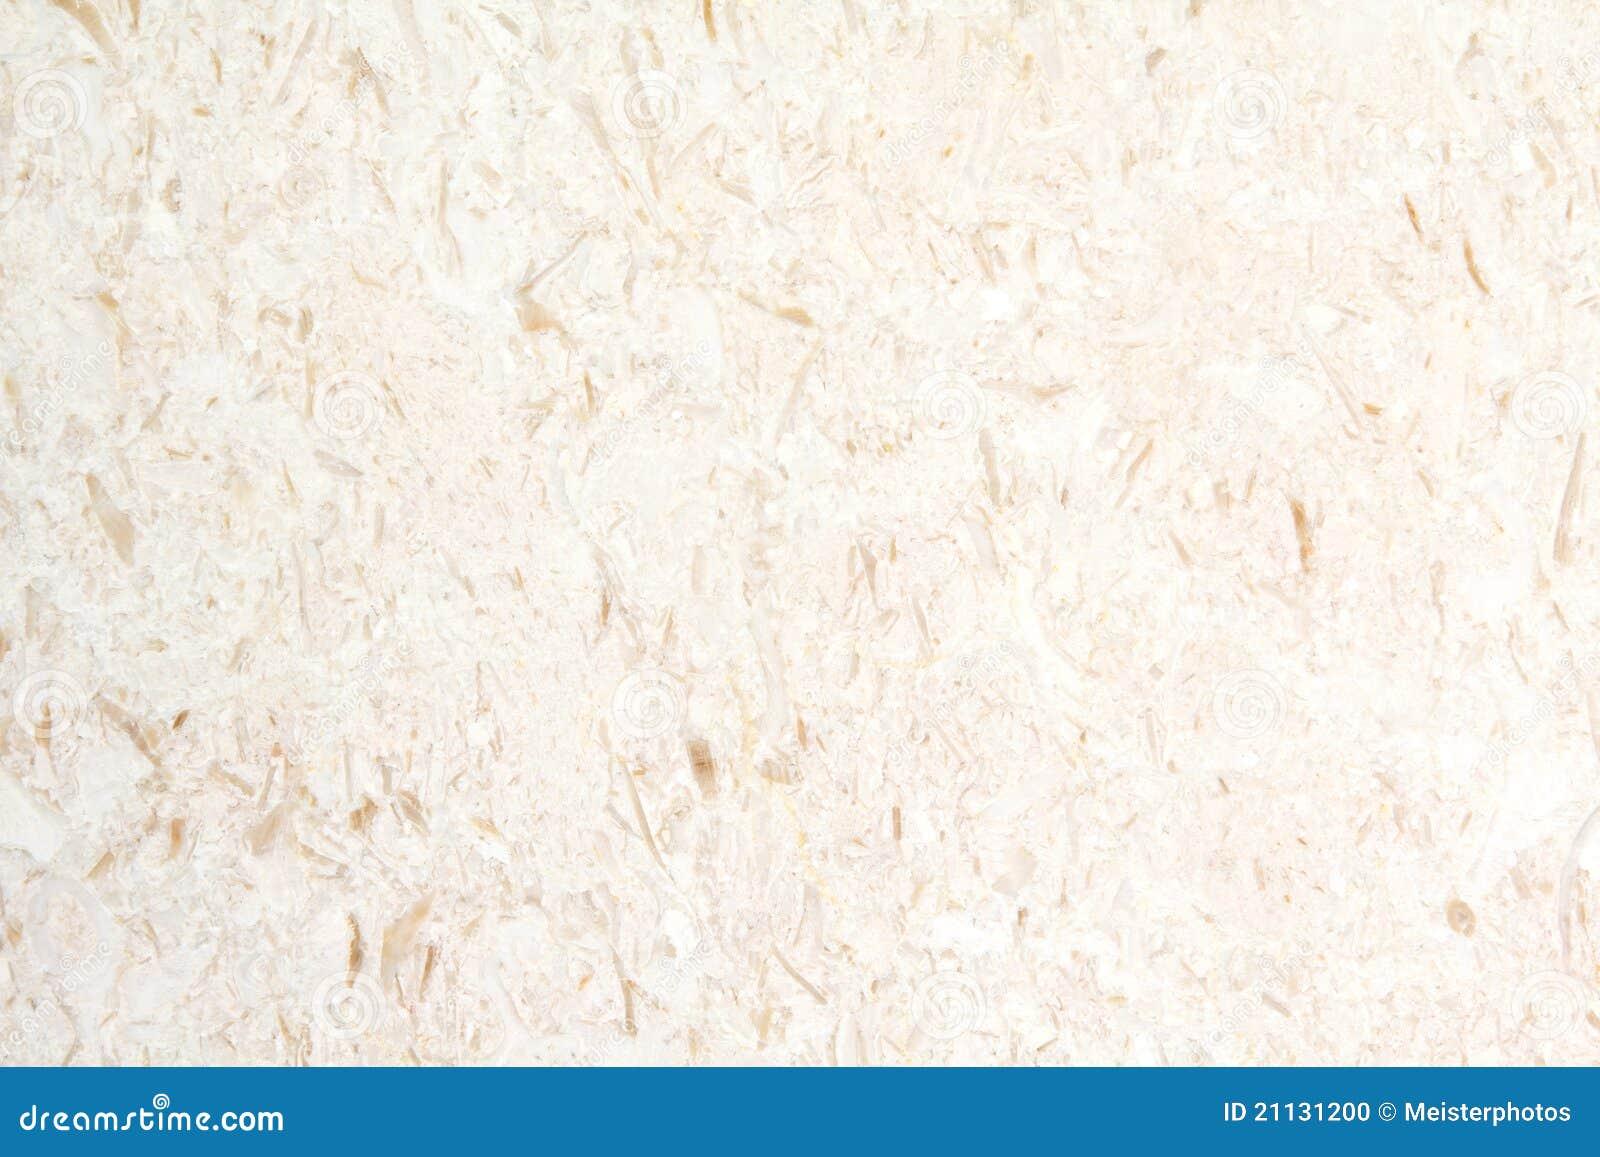 Beige Marble Tile Background Stock Photo Image 21131200